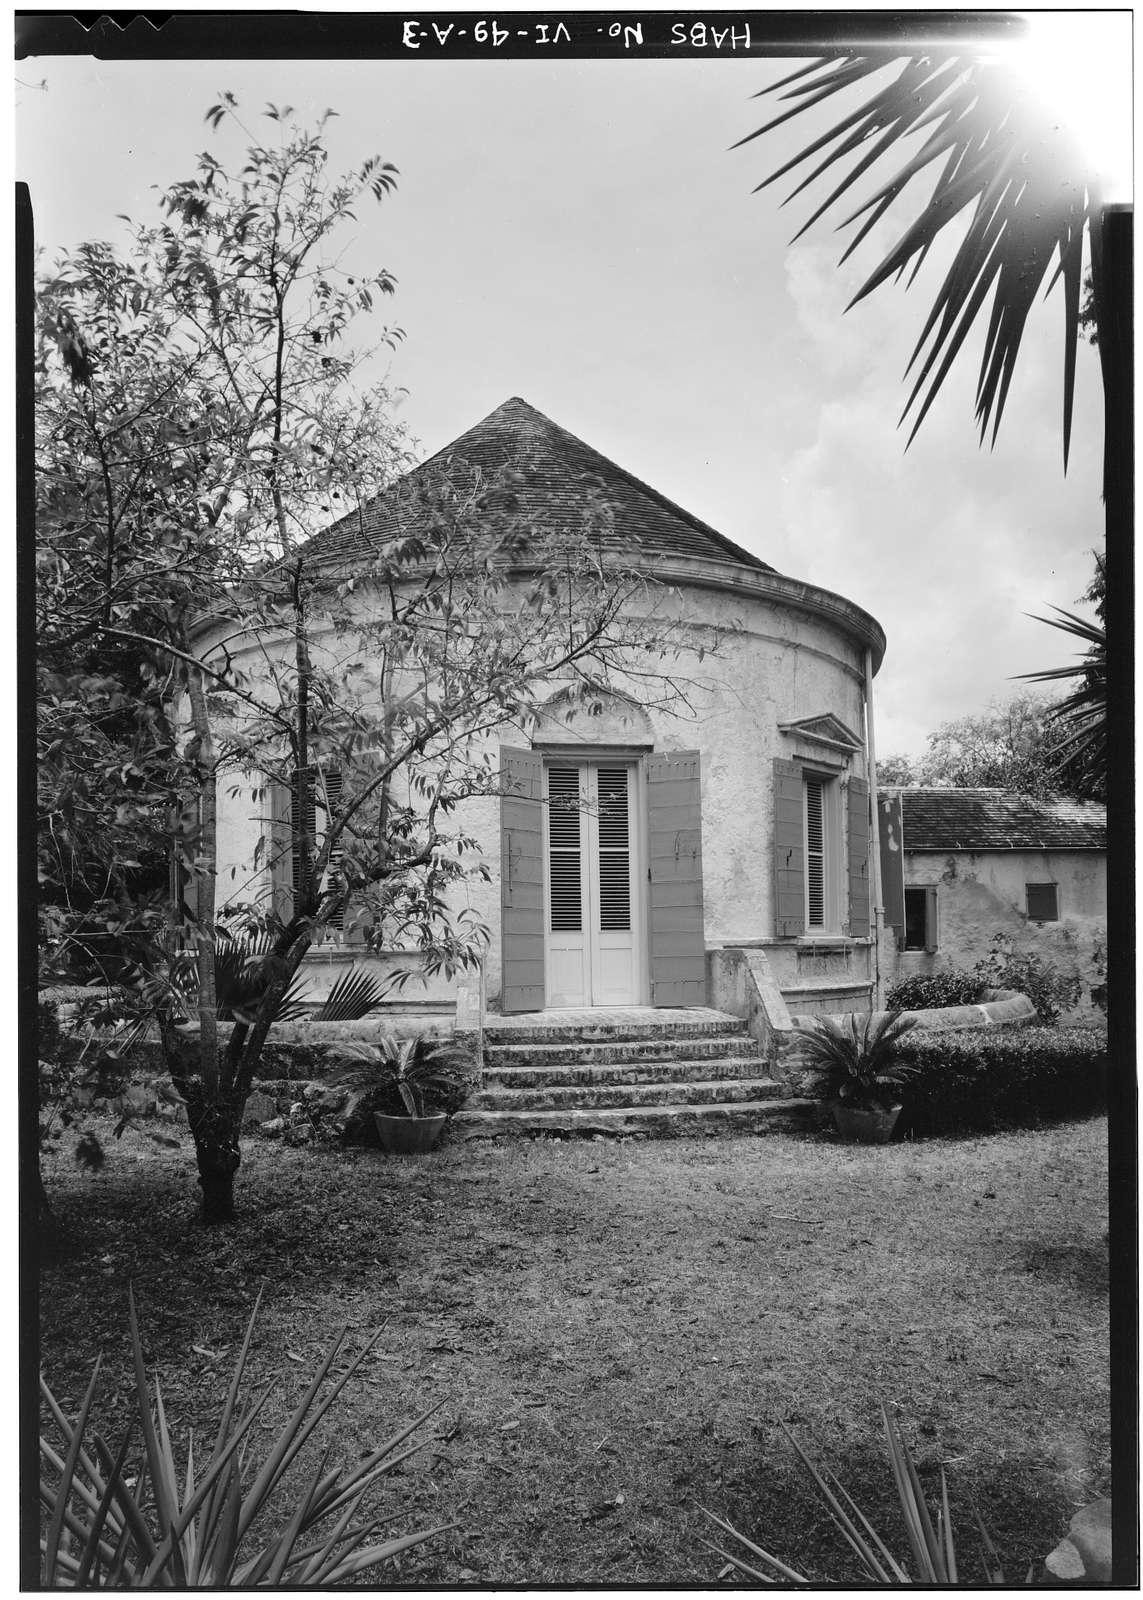 Estate Whim, Great House, Centerline Road, Whim, St. Croix, VI